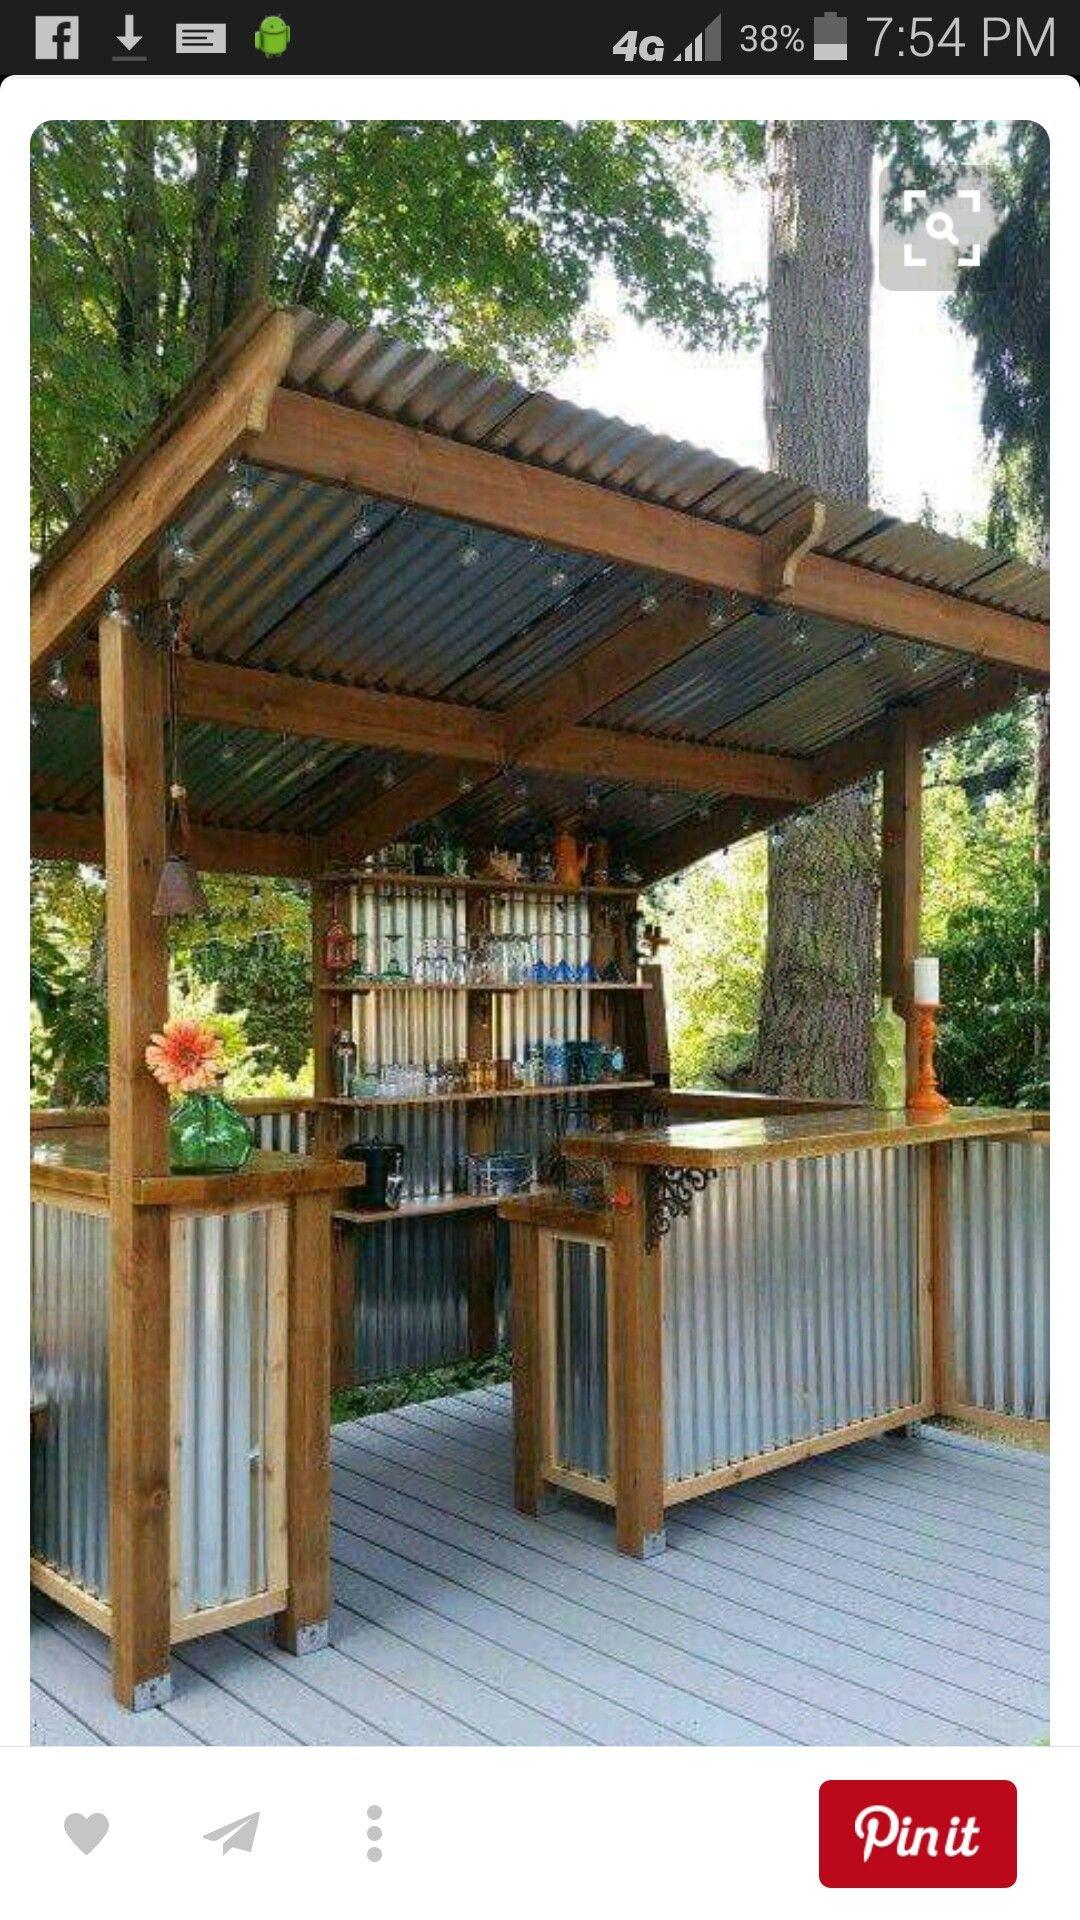 Love it backyard dreams pinterest backyard yards and patios